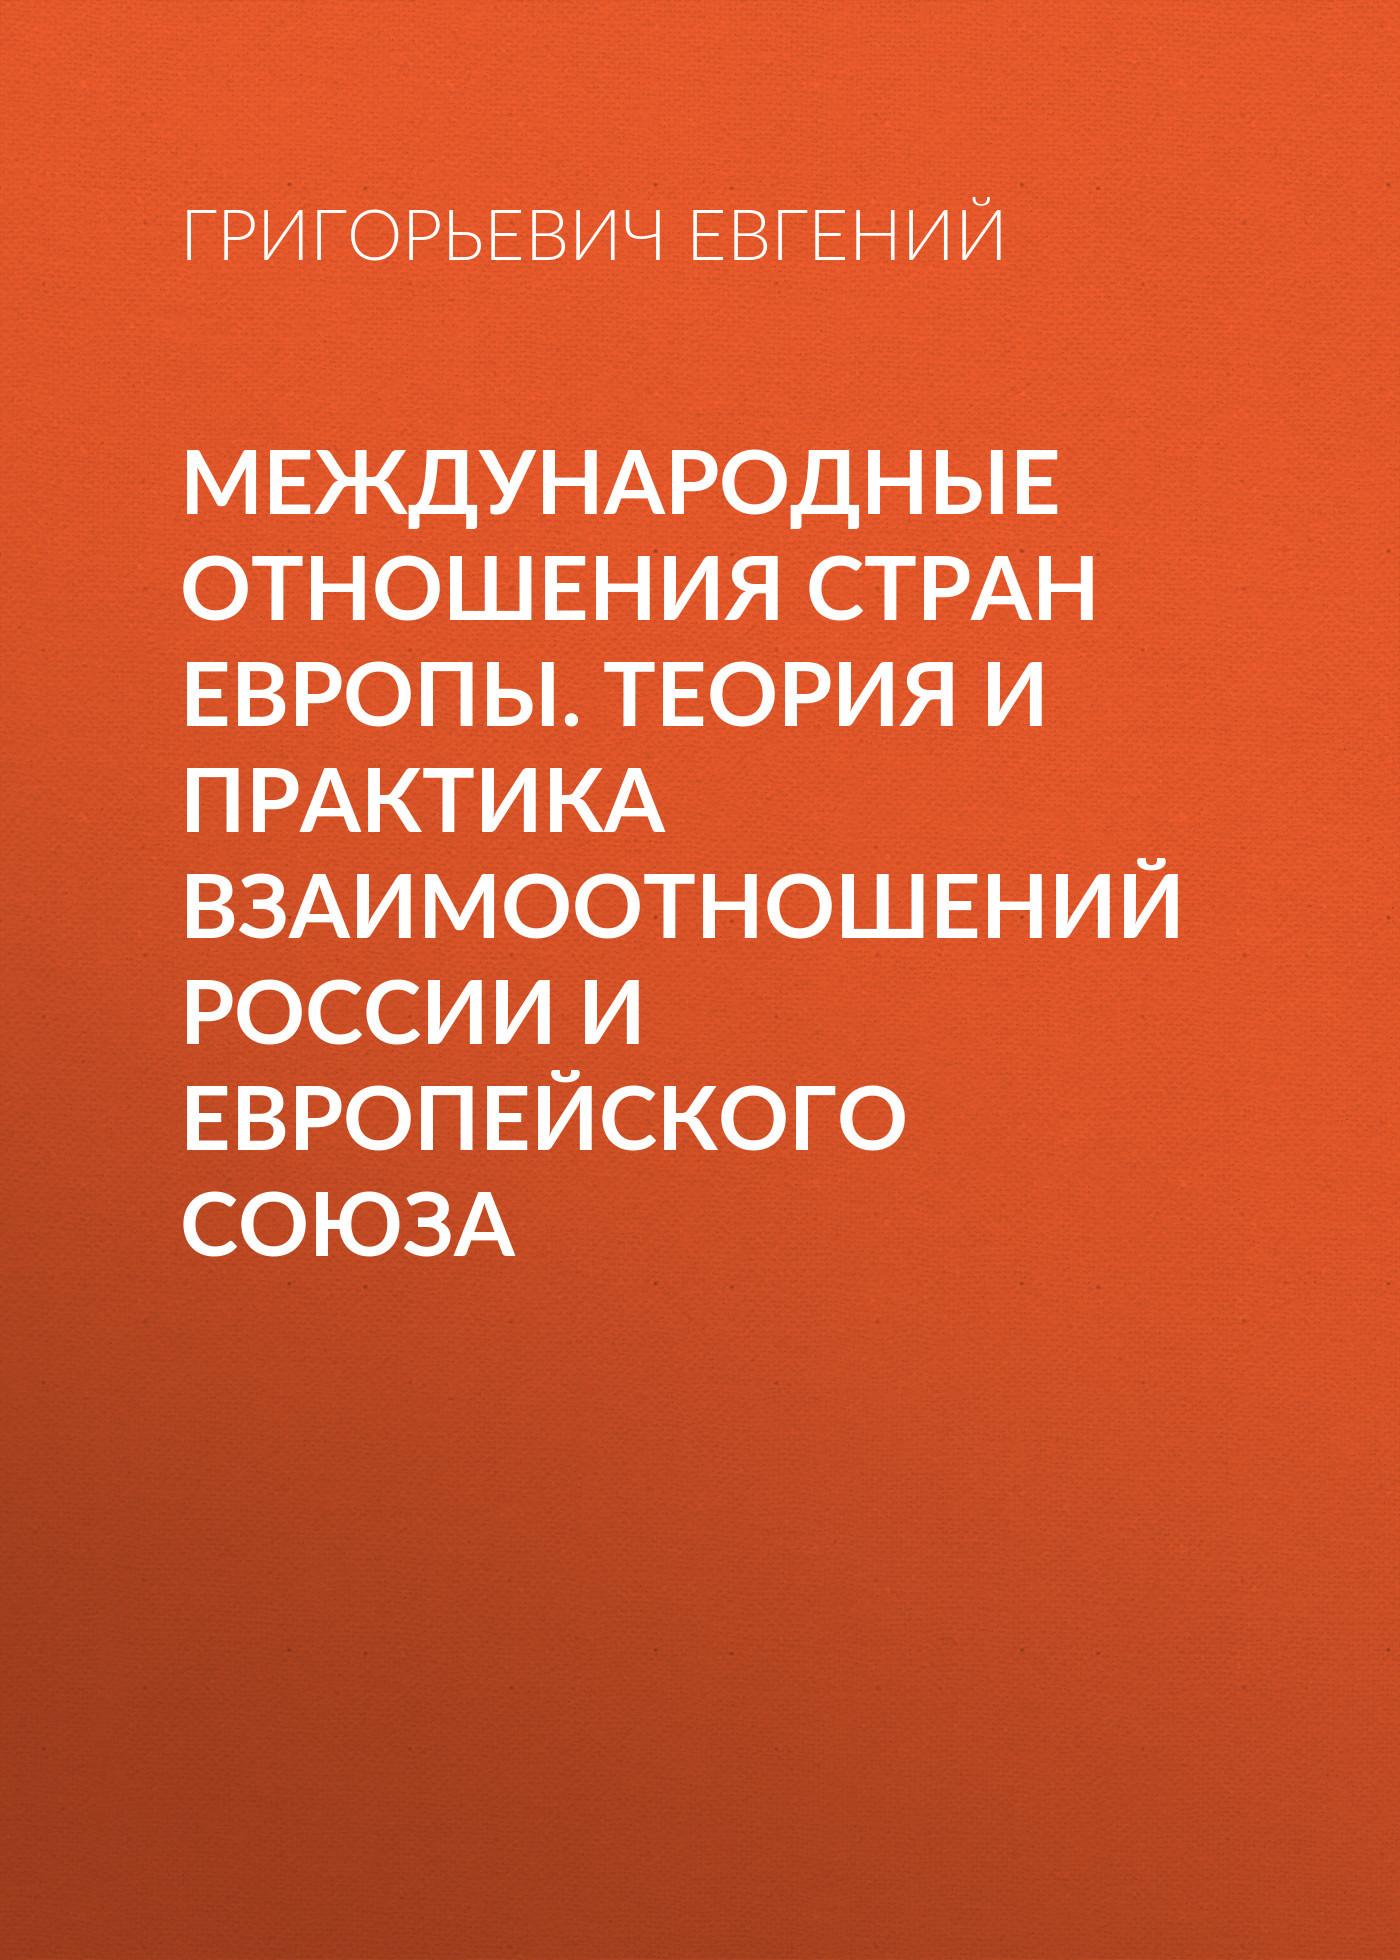 Григорьевич Евгений бесплатно